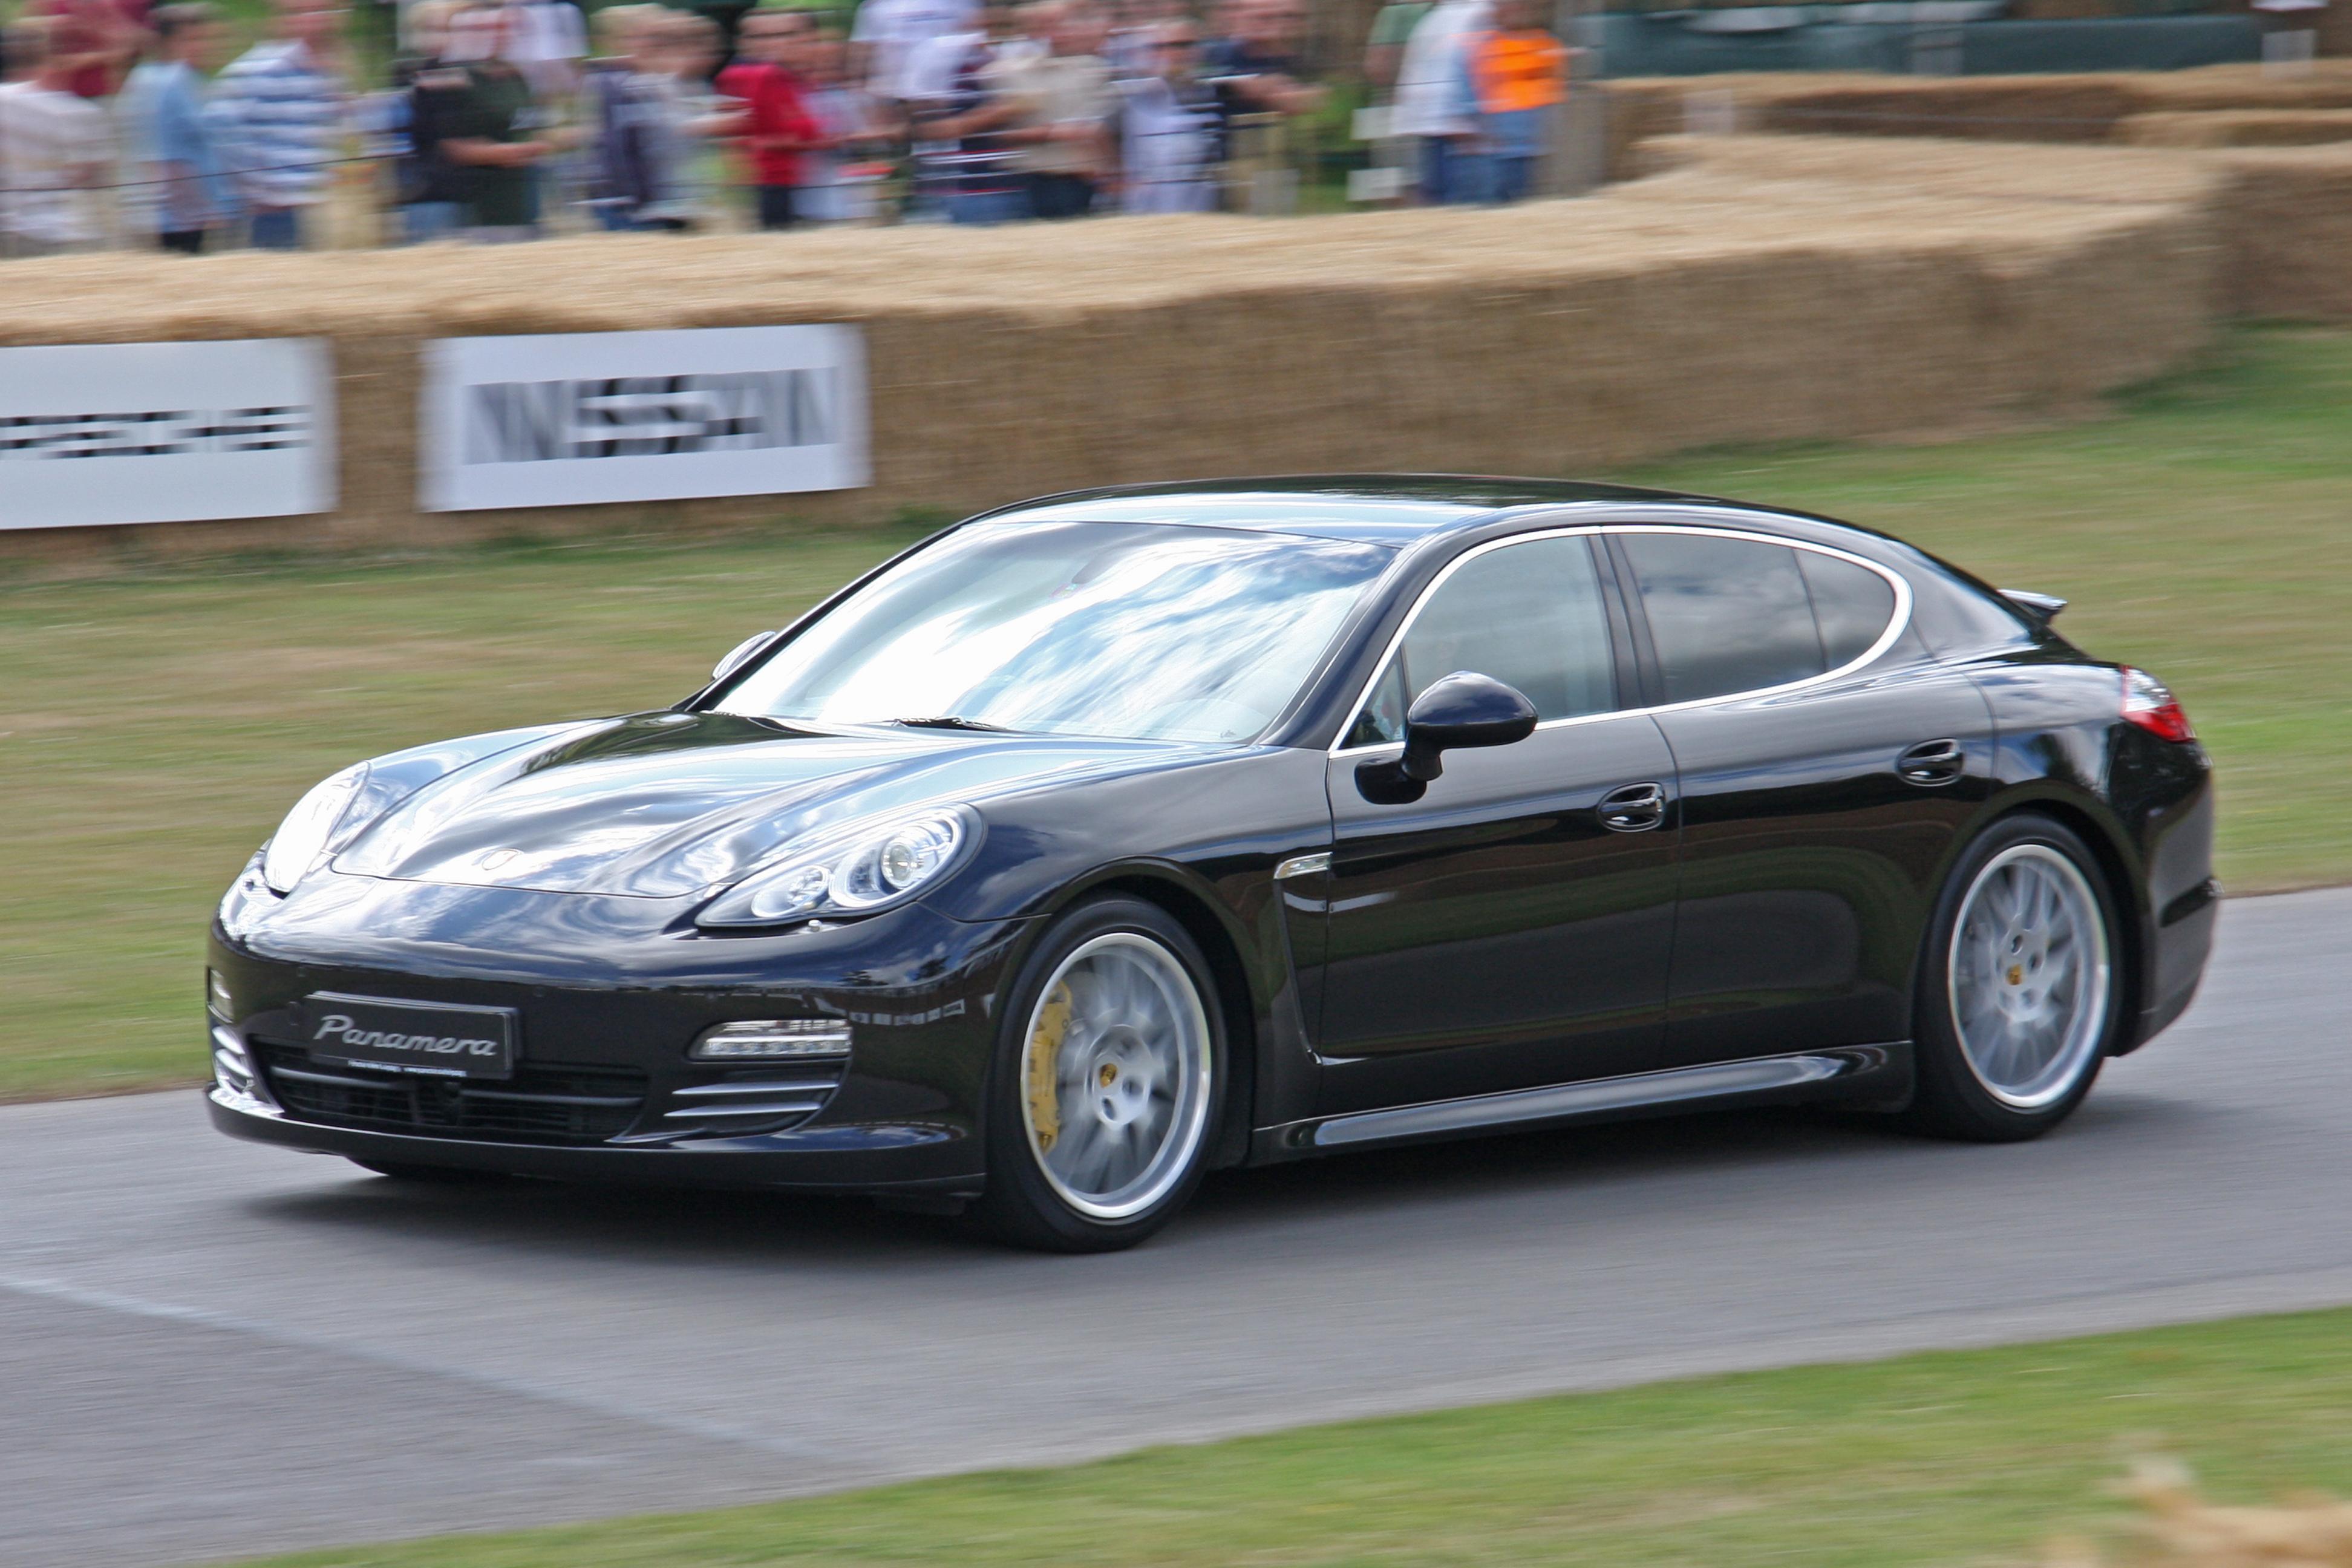 2009 Porsche Panamera S